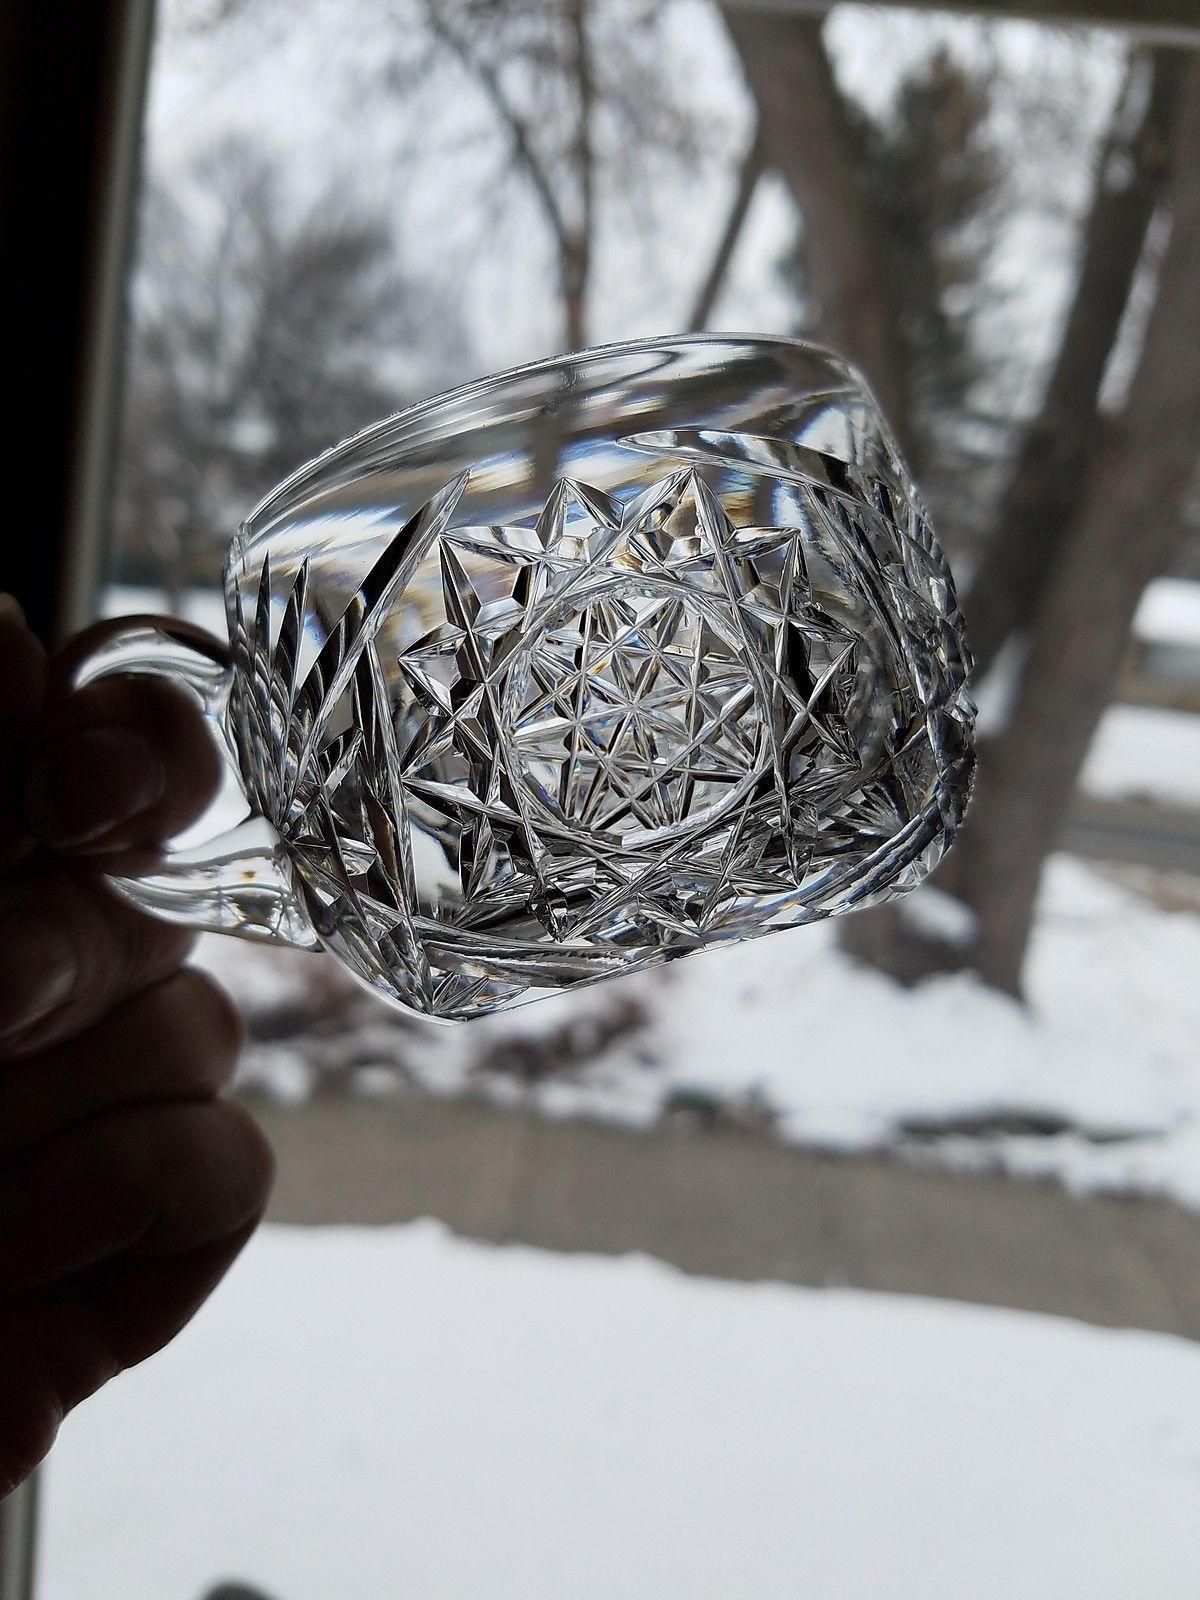 American Brilliant Period Cut Punch Cups Handled Hobstar Fans Fine Diamond - $27.95